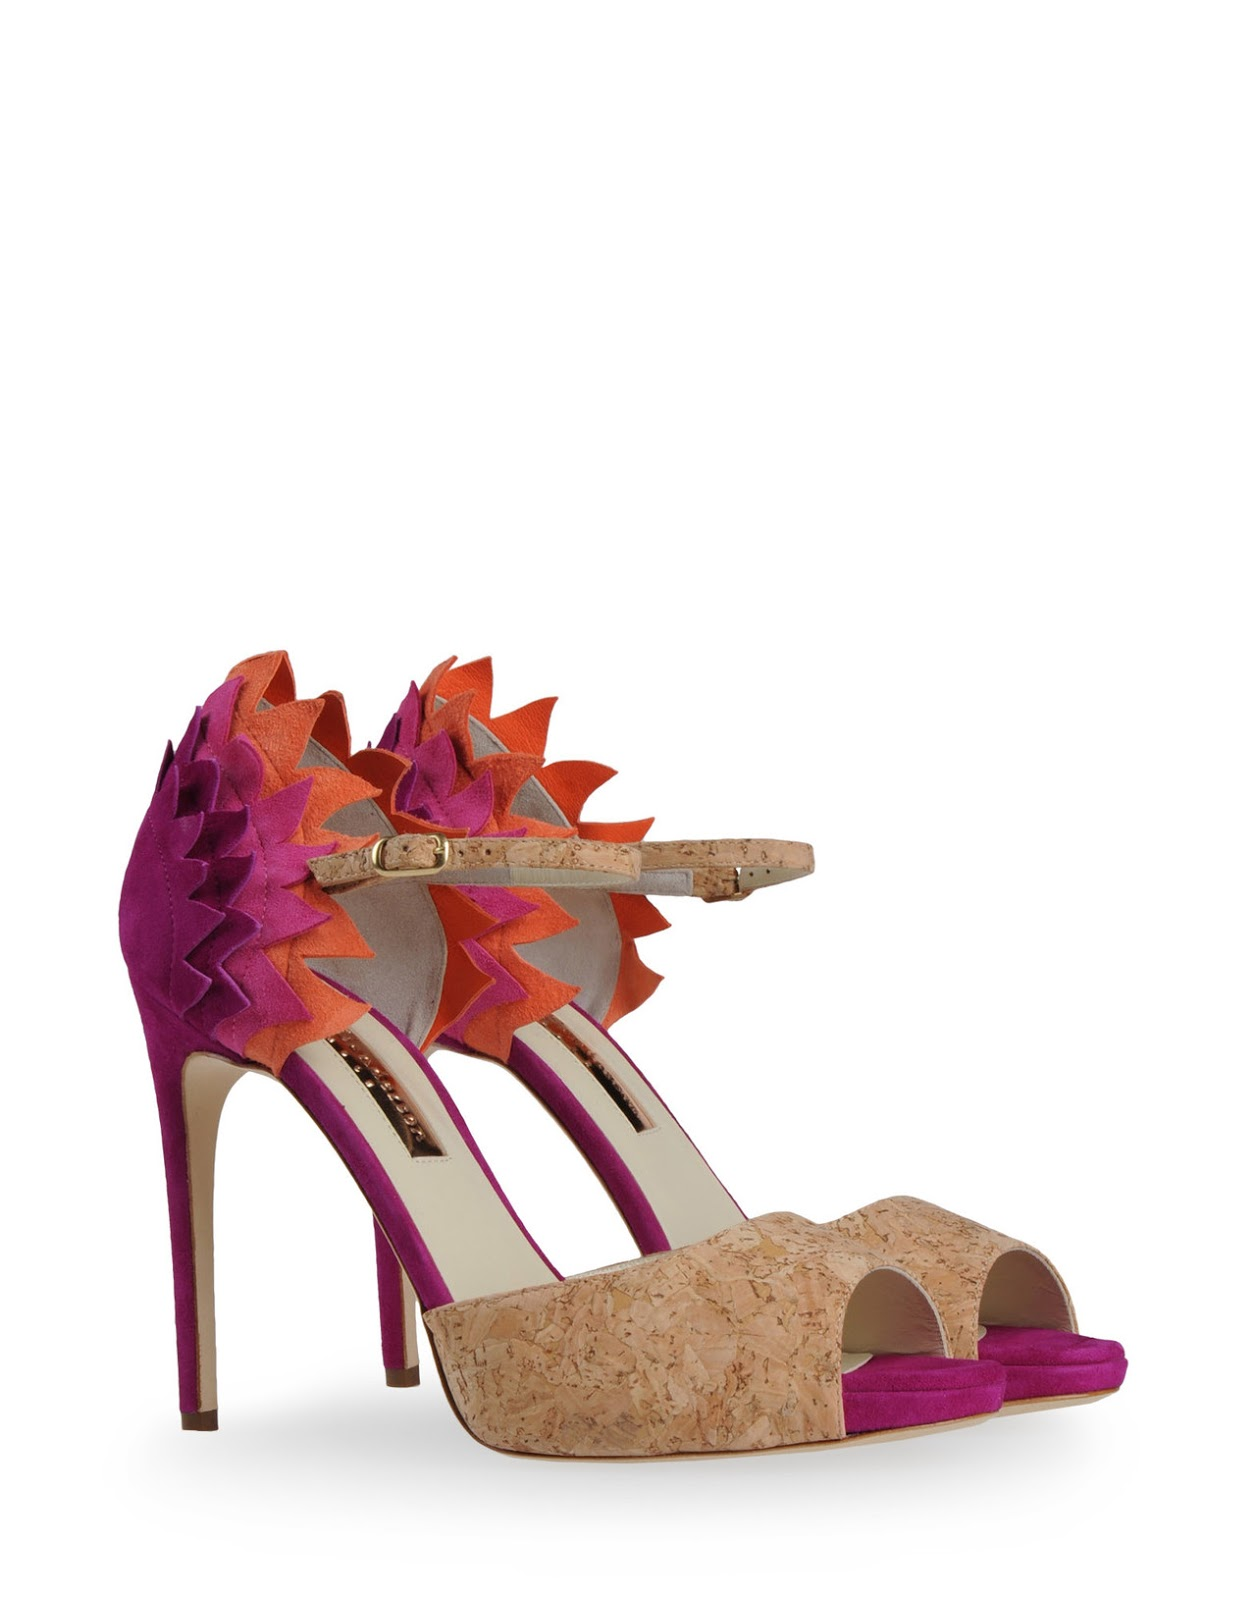 d0d5e4c5031b8 zapatos fiesta mujer pink